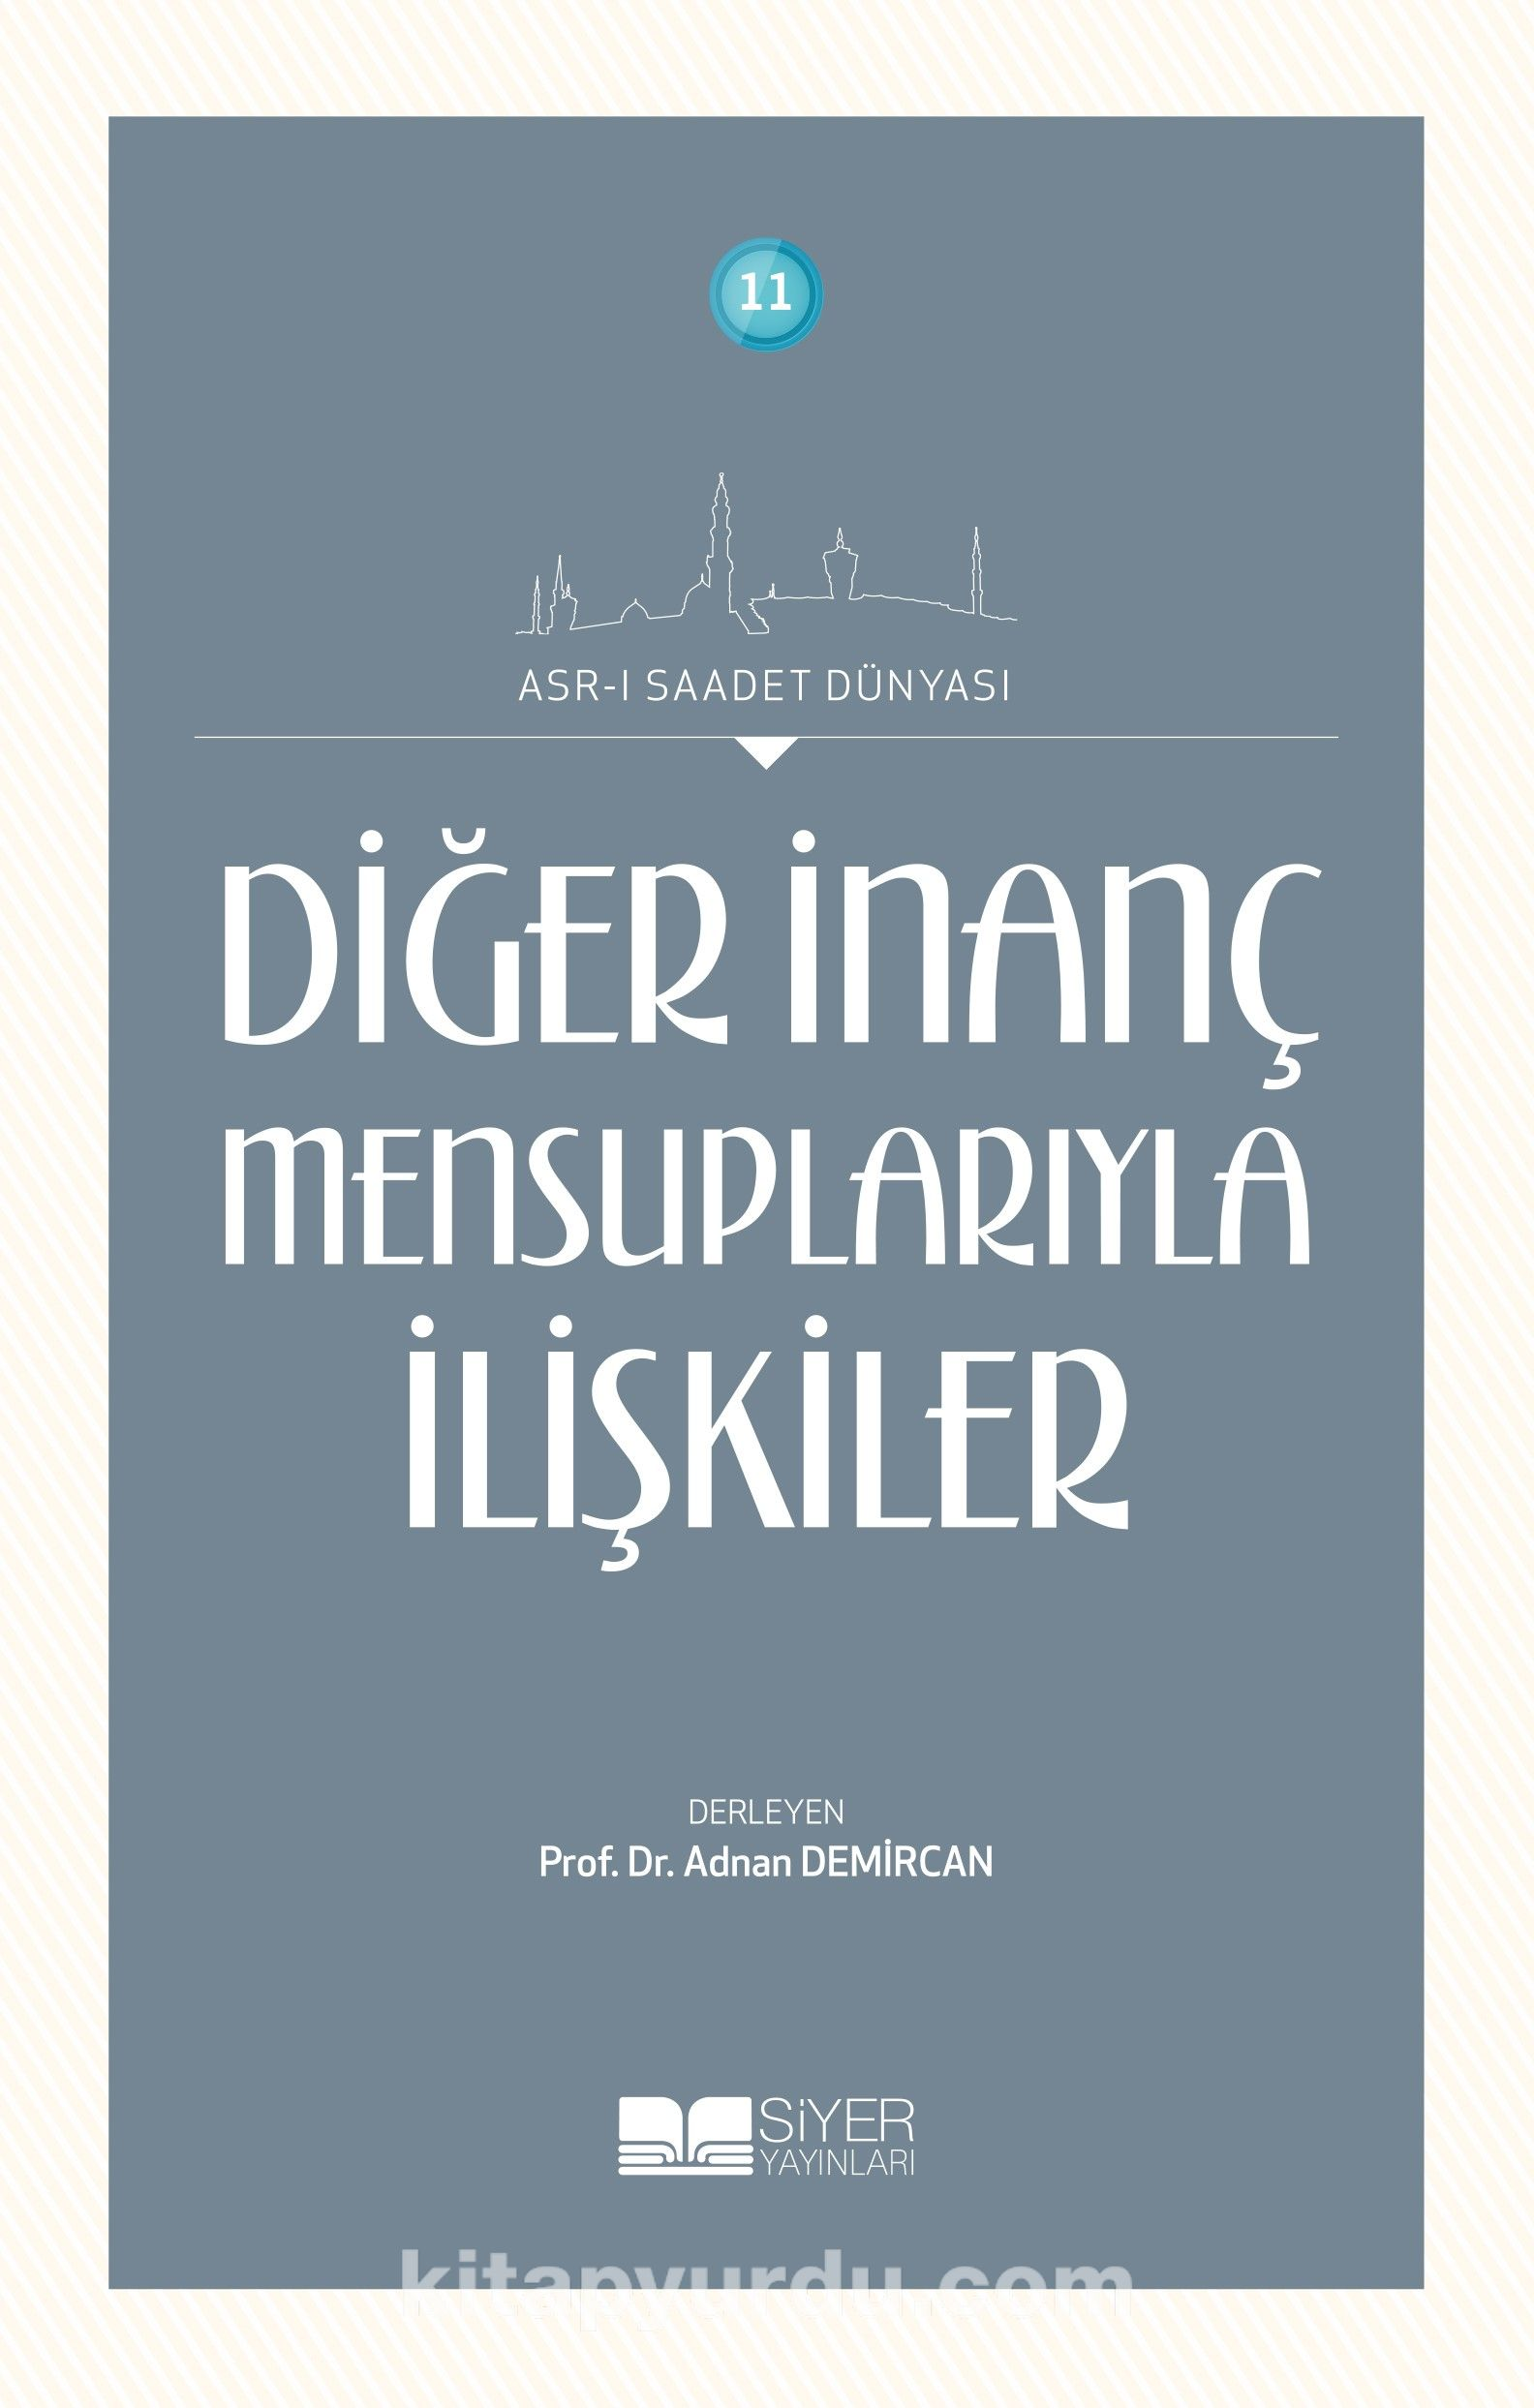 Diğer İnanç Mensuplarıyla İlişkiler - Prof. Dr. Adnan Demircan pdf epub